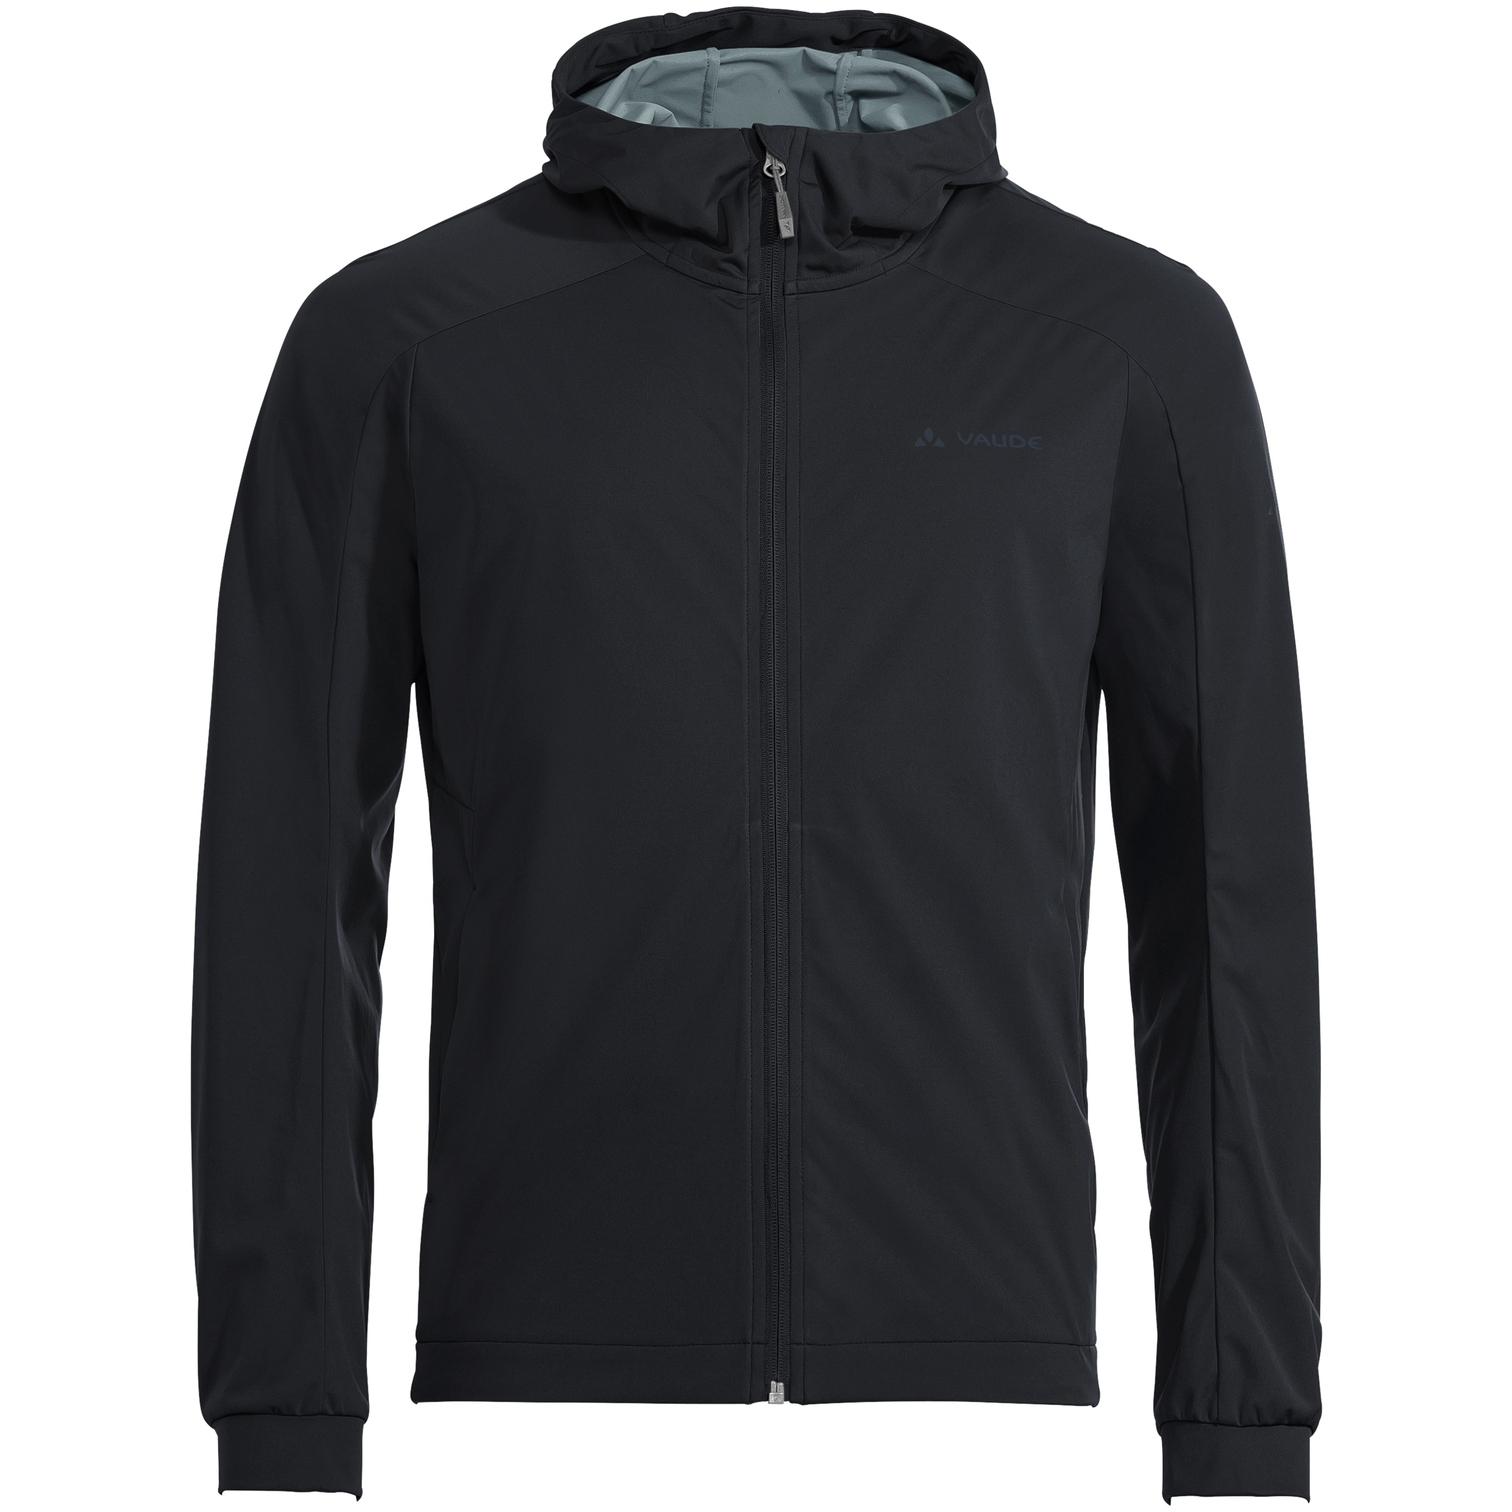 Vaude Men's Cyclist Softshell Jacket II - black